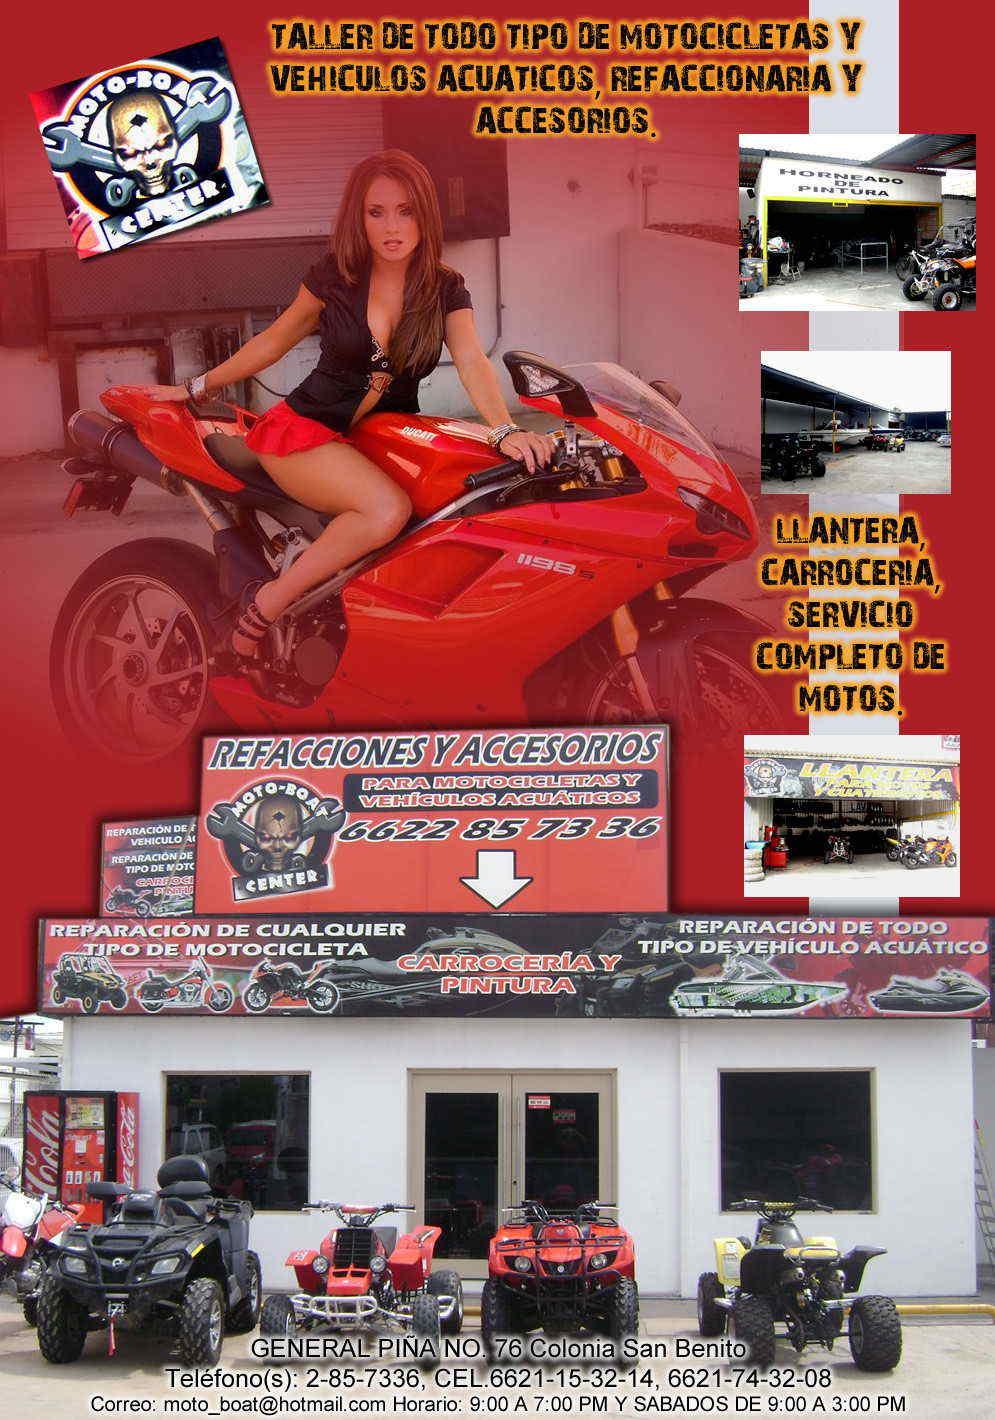 Moto boat center en hermosillo anunciado por zonacomercial for Refaccionarias en hermosillo